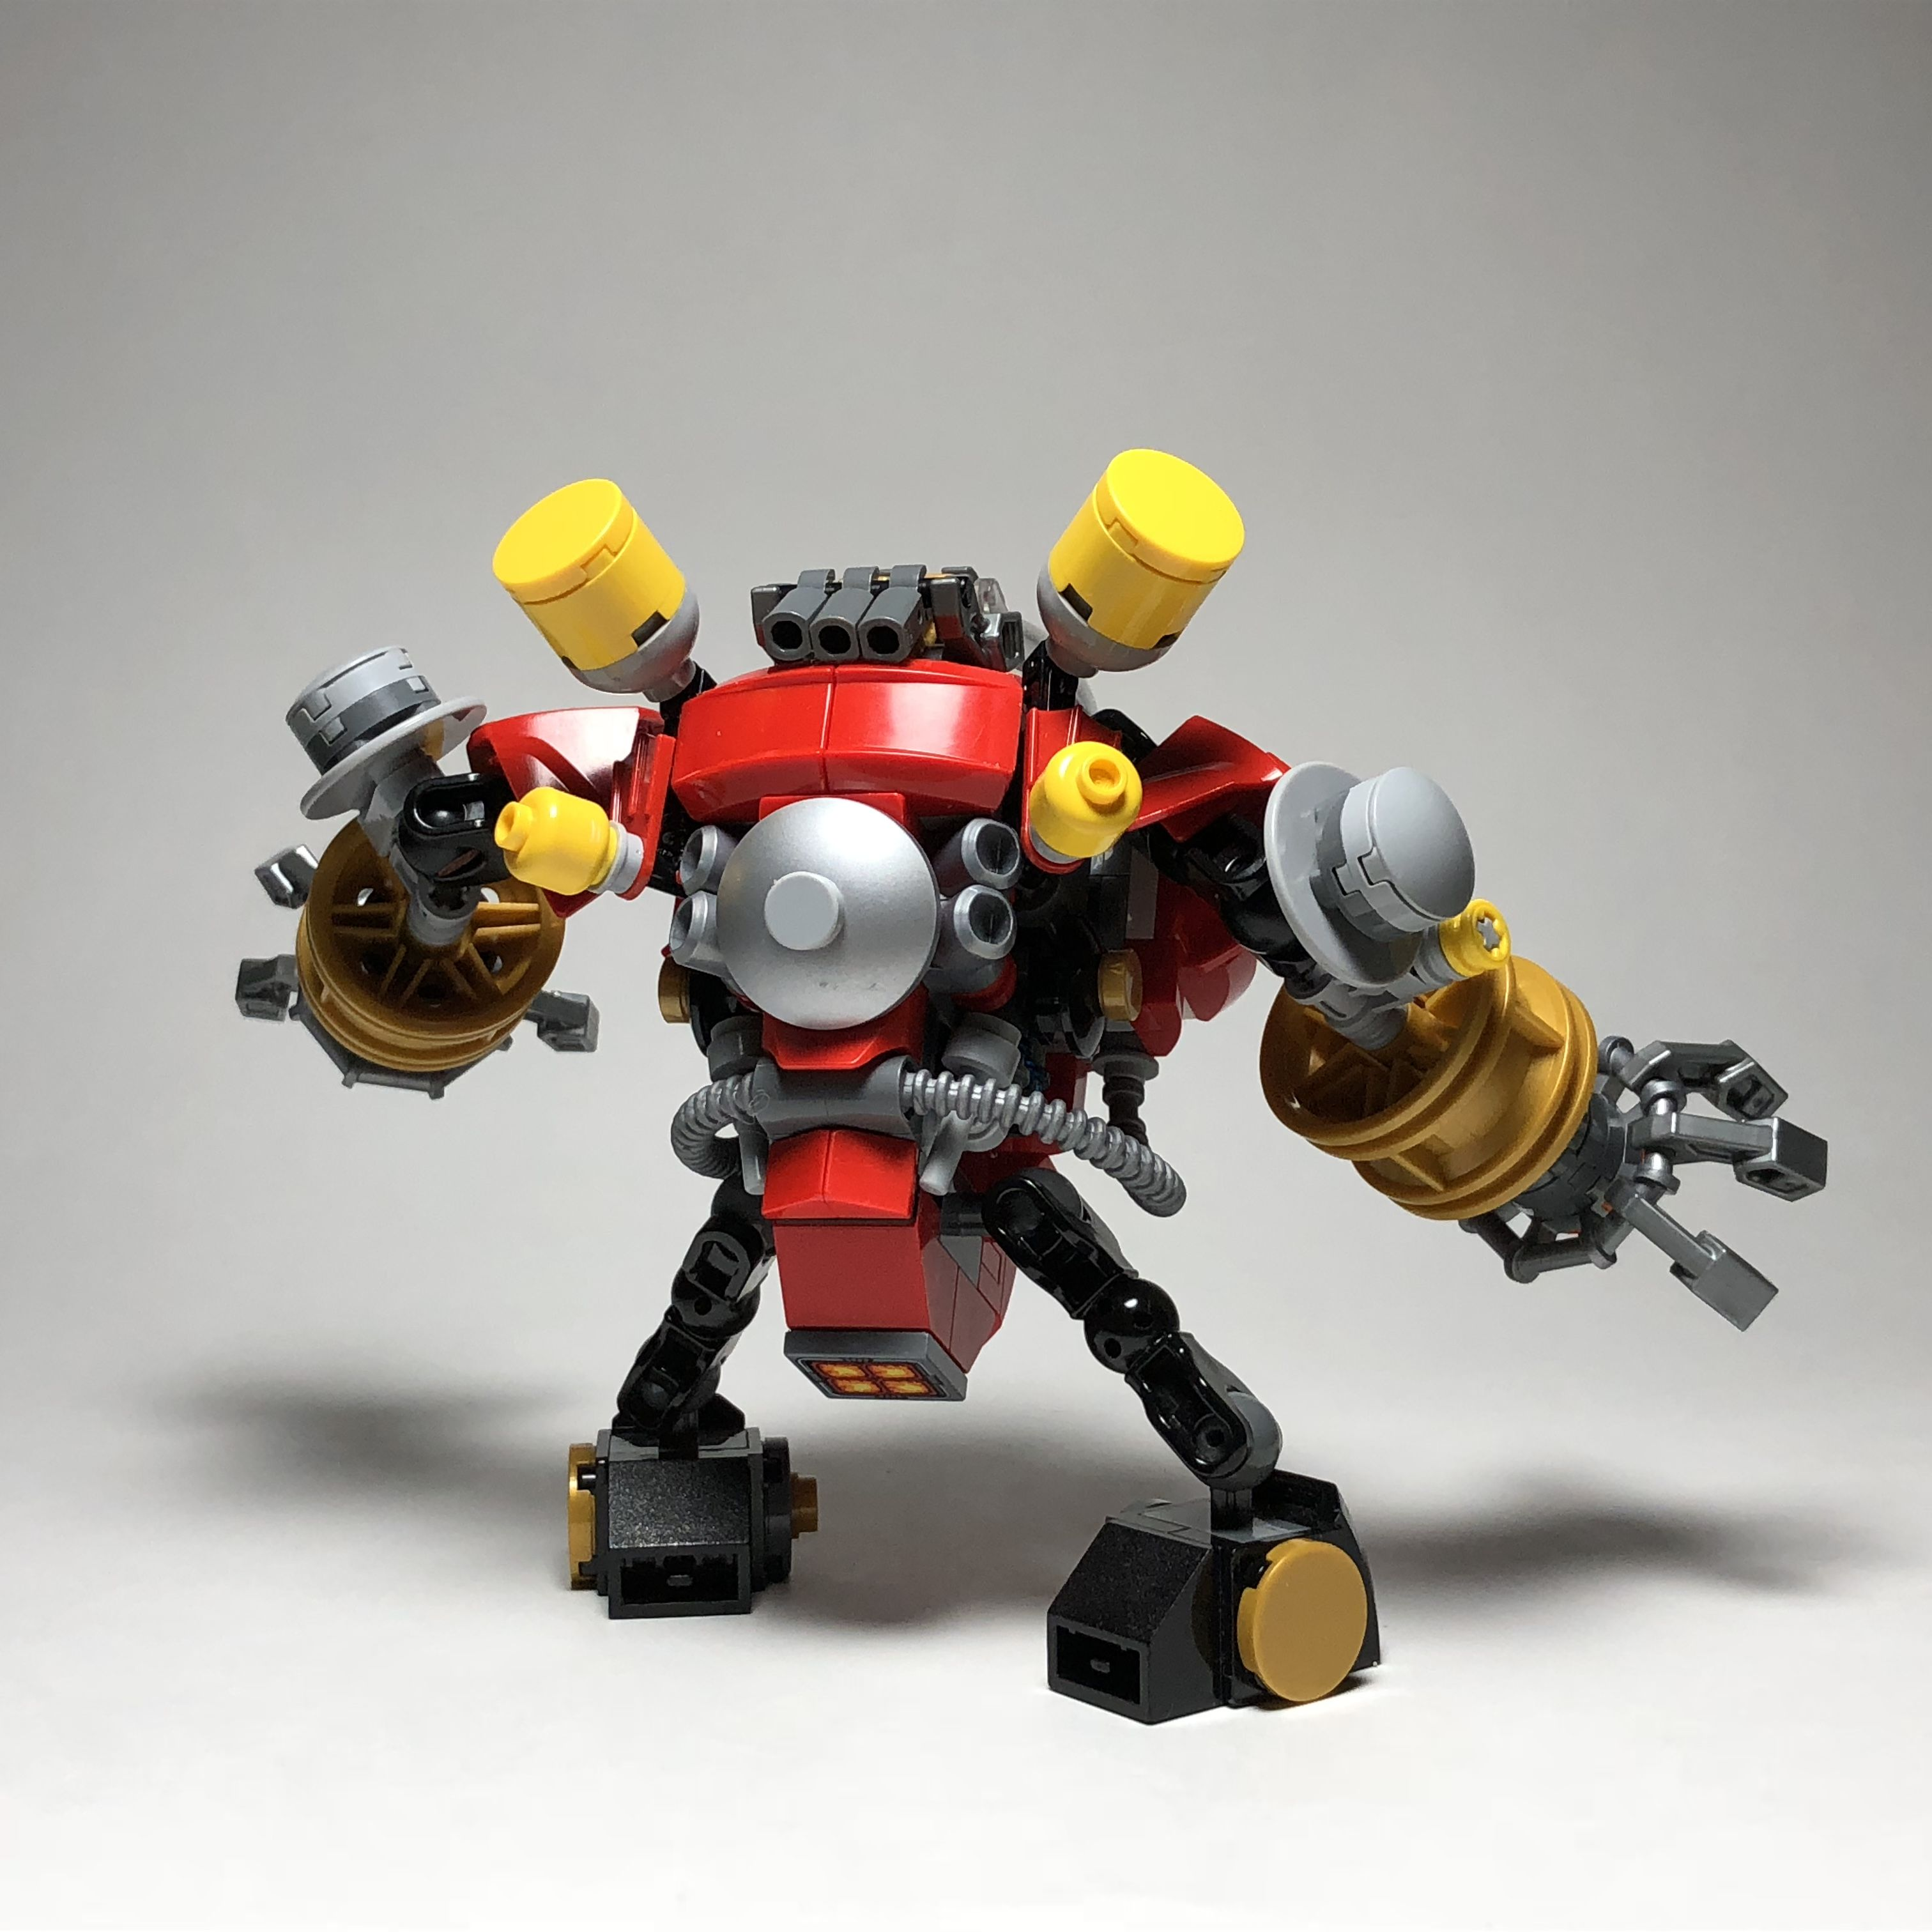 LEGO ideas sonic the hedgehog vs. dr. Eggman | LEGO ideas ...